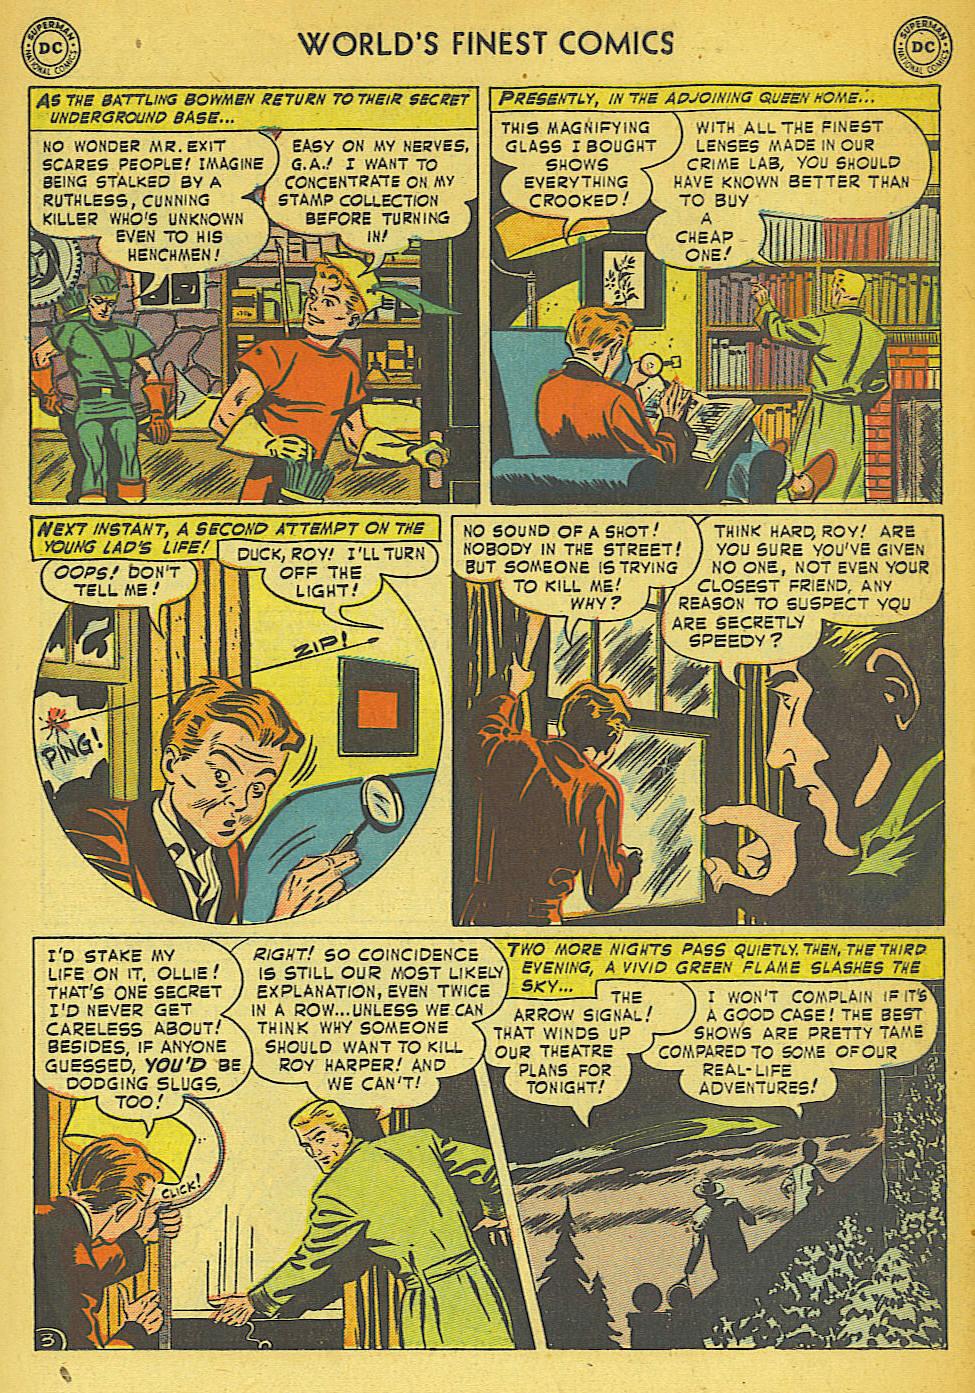 Read online World's Finest Comics comic -  Issue #57 - 19